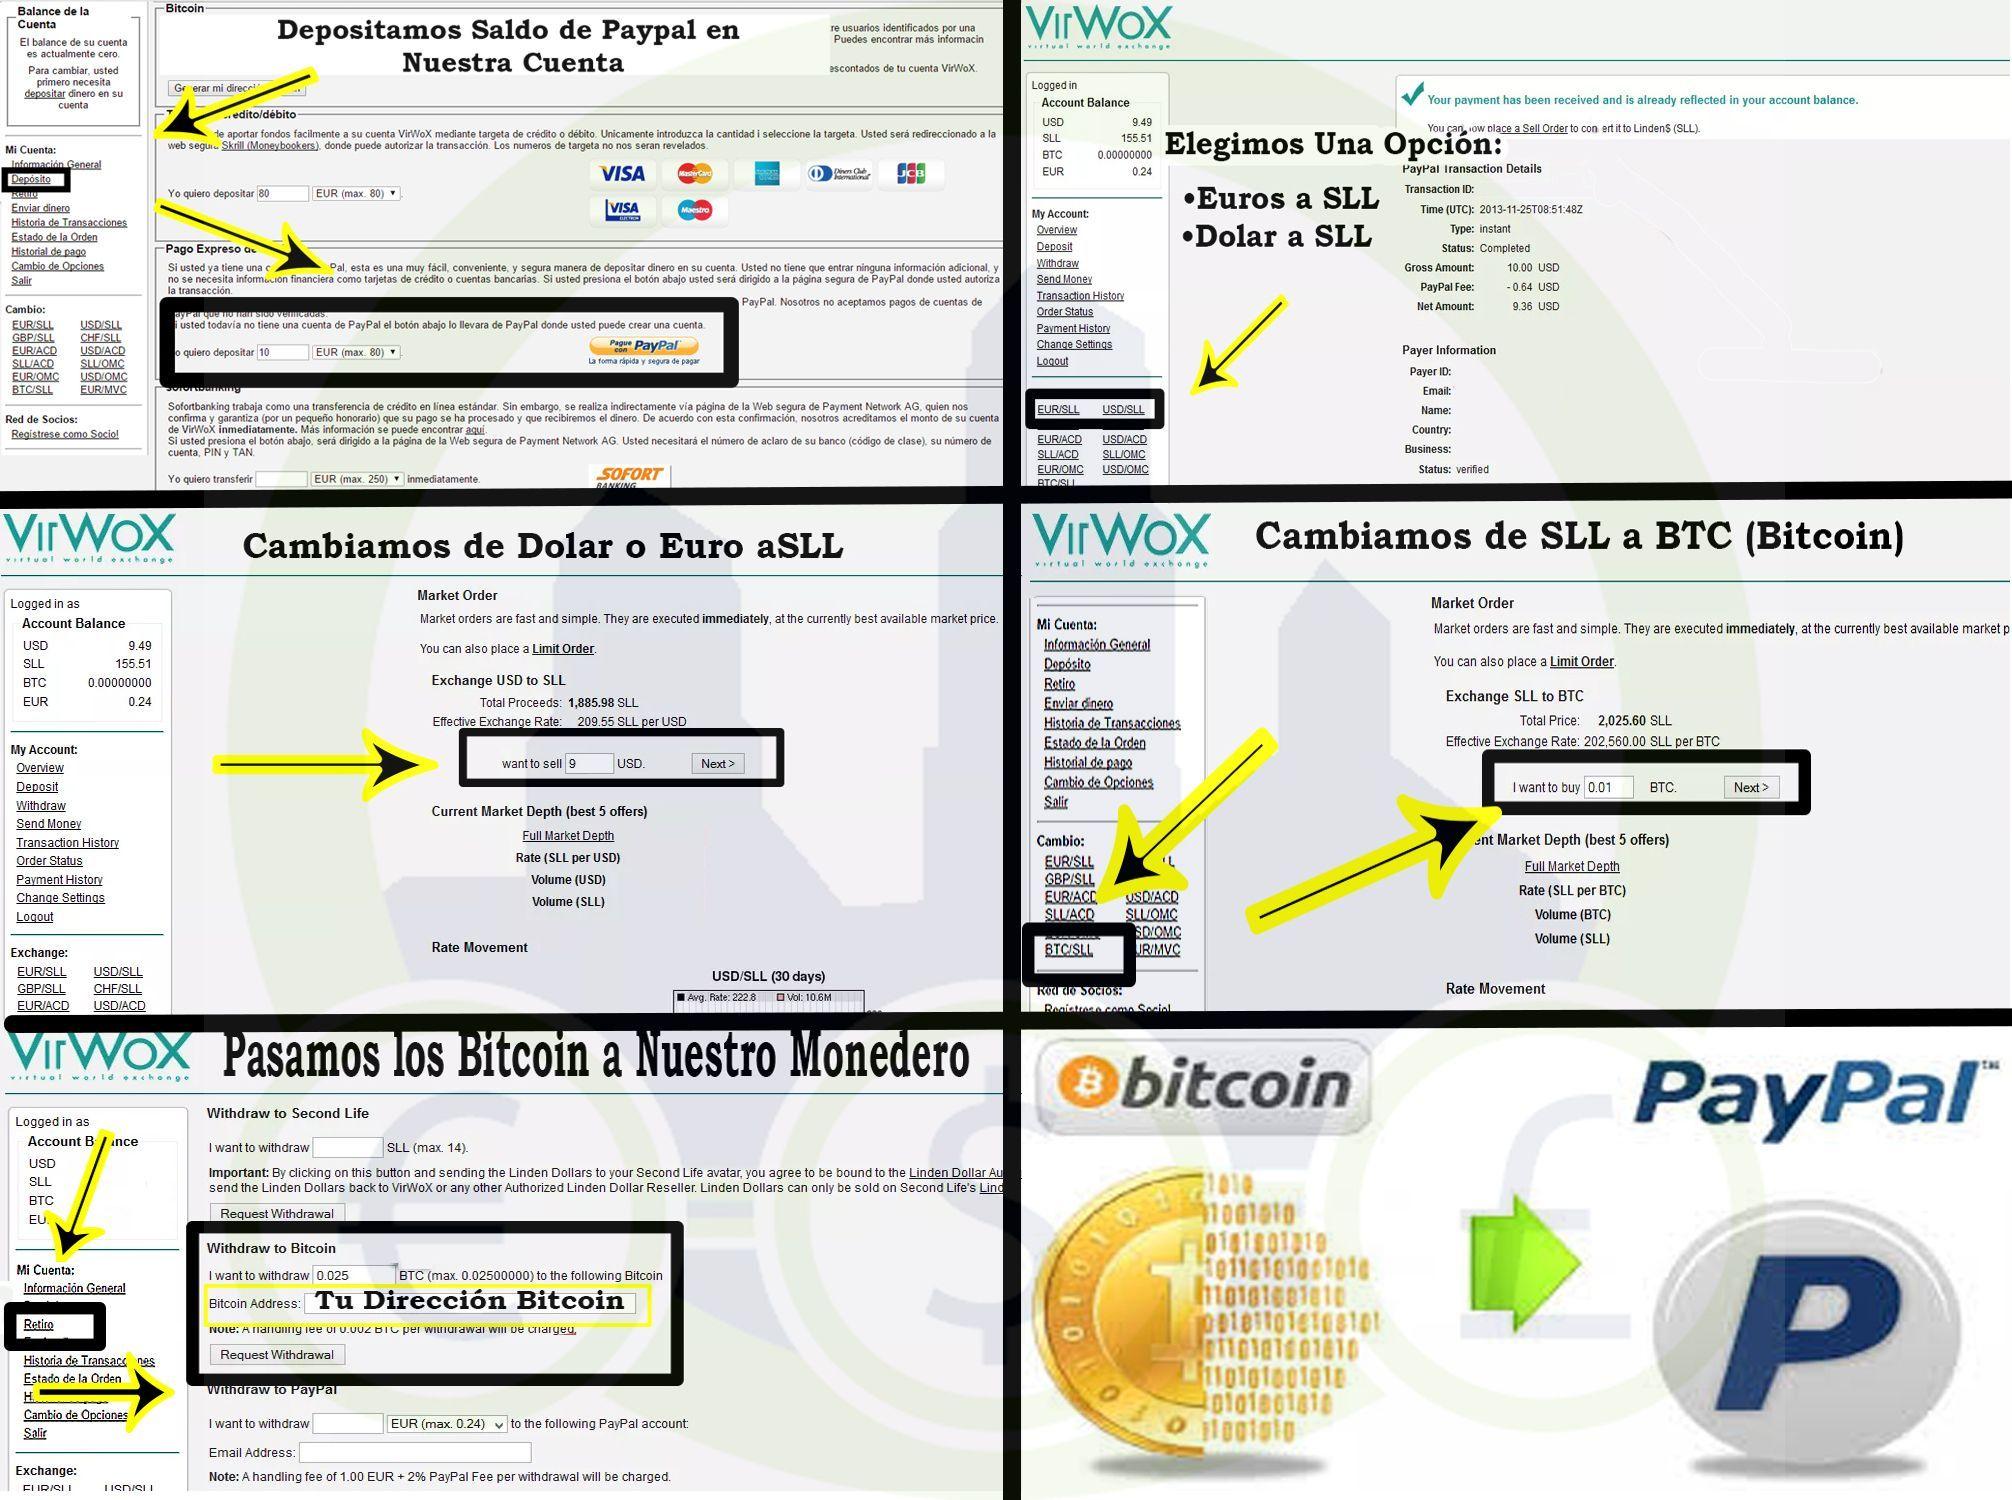 Comprar bitcoins con Paypal virwox | Cryptocurrency 101